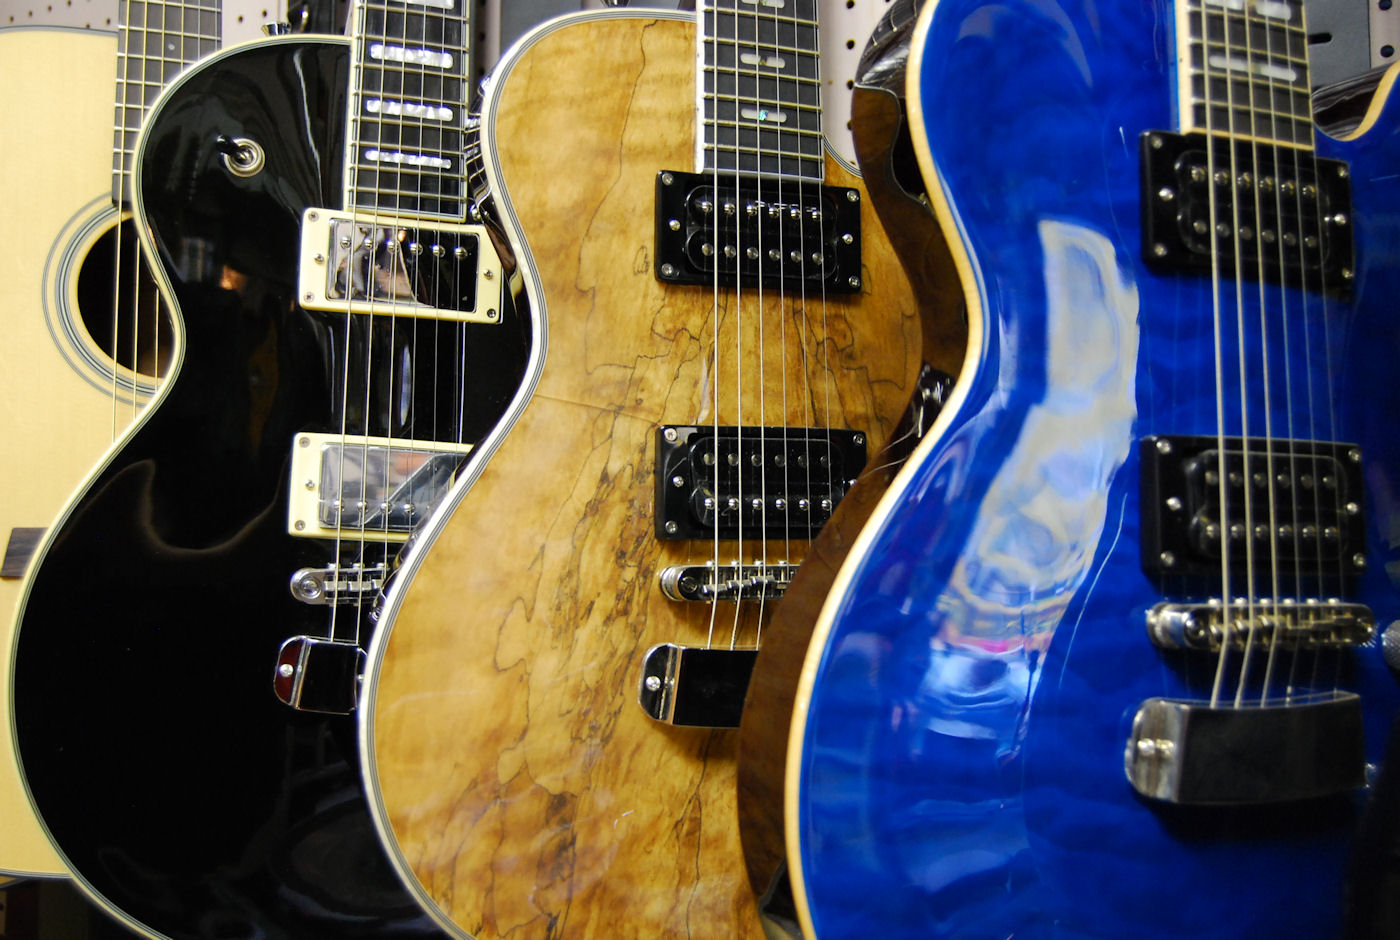 cursos de guitarra electrica gratis